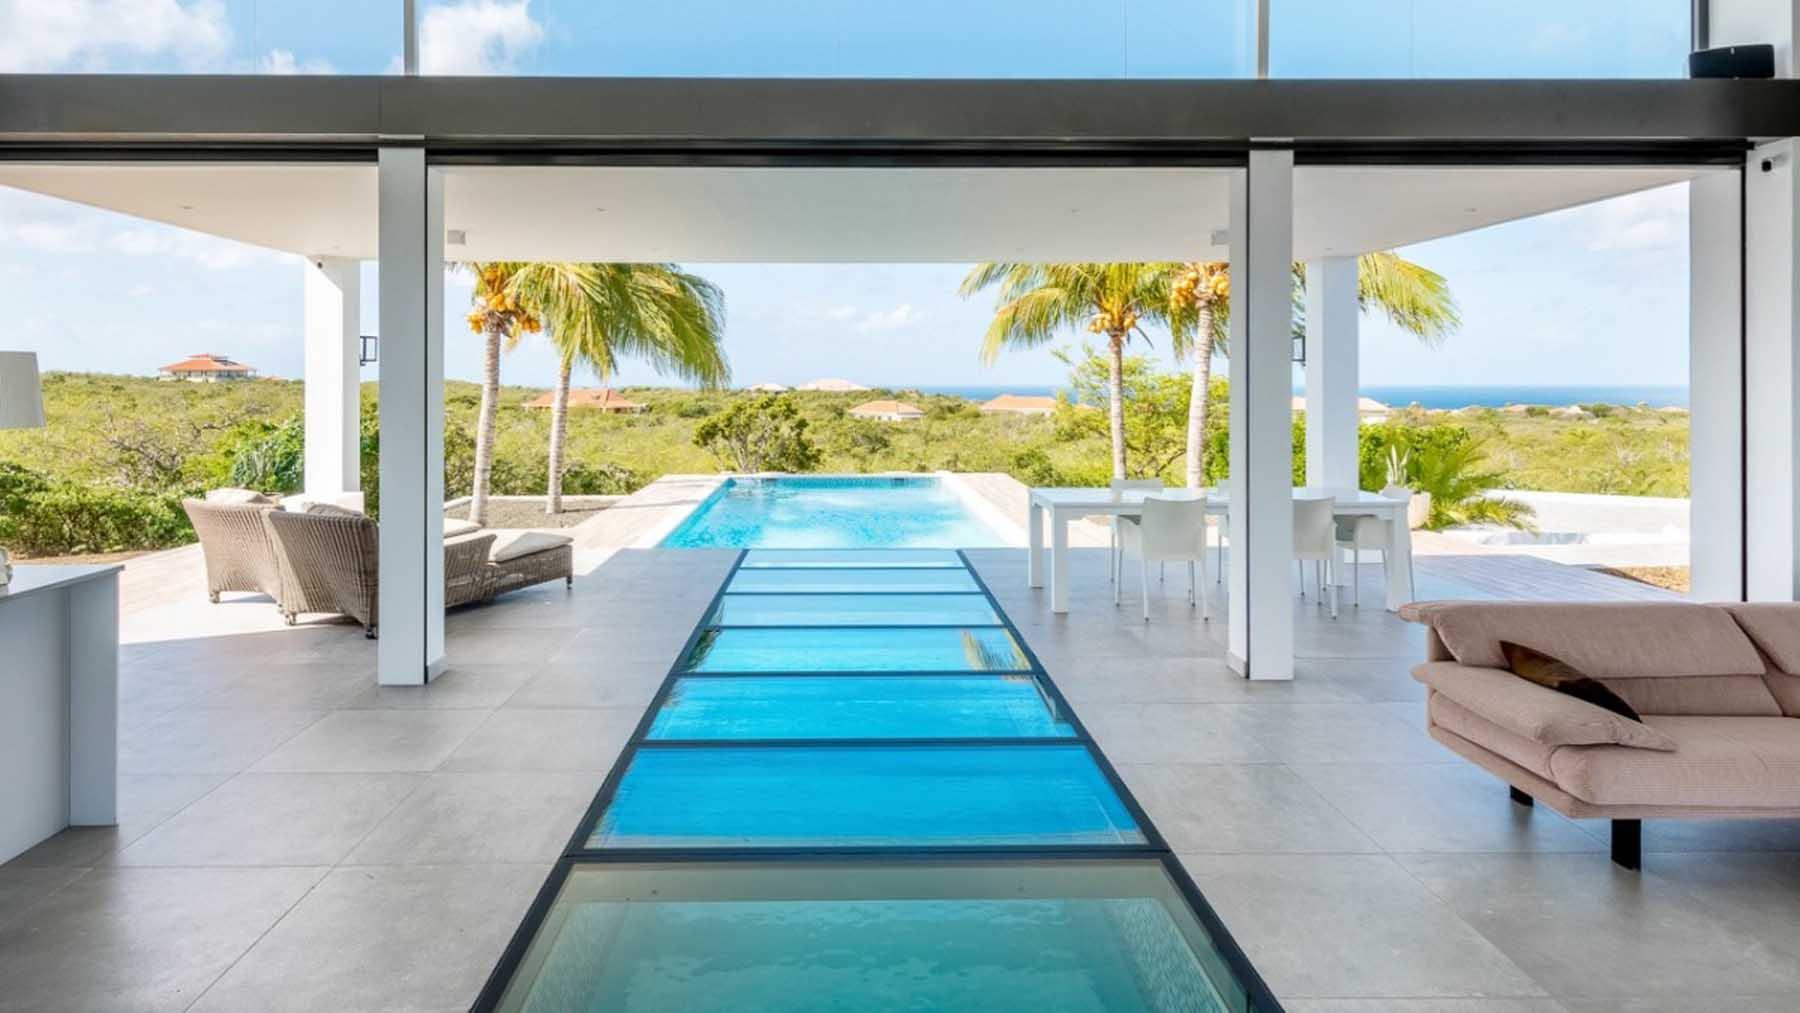 Glazen vloer zwembad binnen buiten terras tropisch modern coral